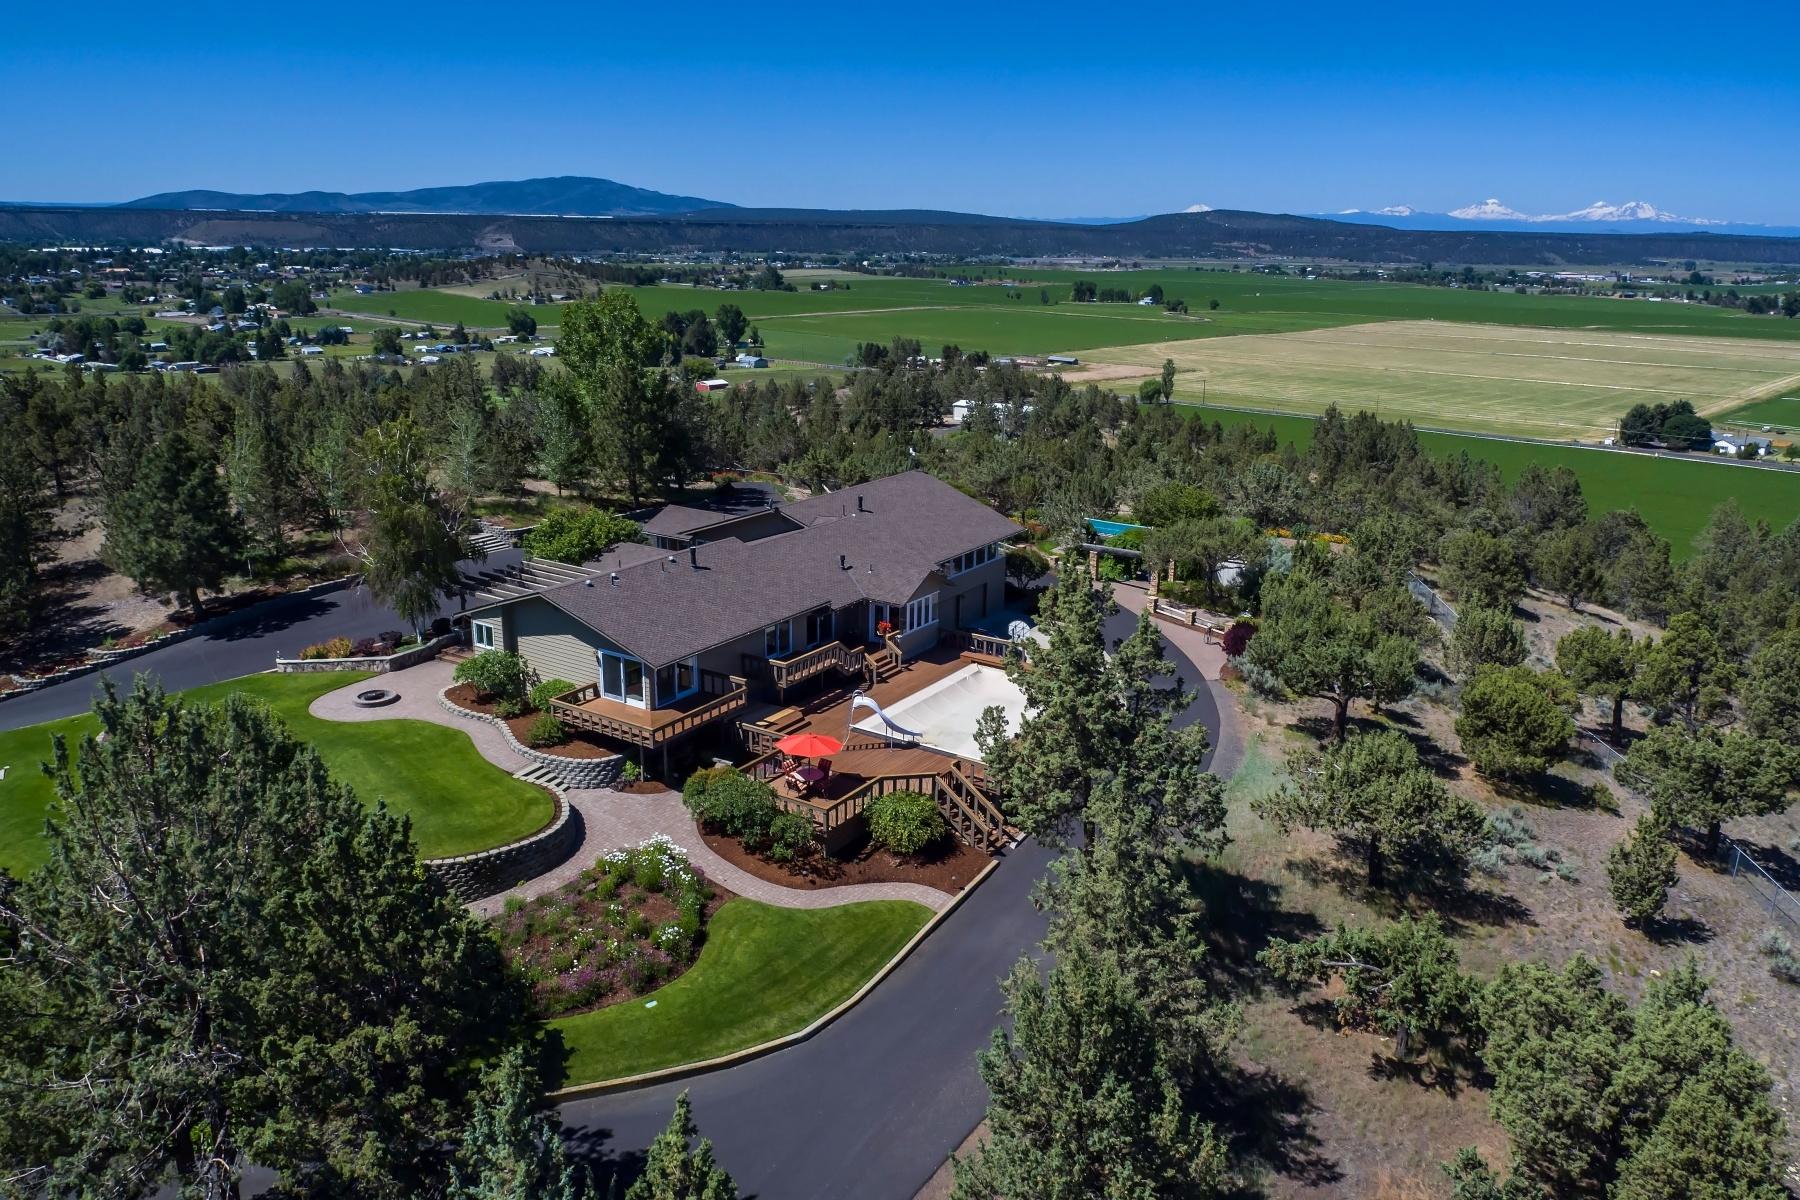 Other Residential Homes για την Πώληση στο 4720 N McKay Road Prineville, OR 97754 Prineville, Ορεγκον 97754 Ηνωμένες Πολιτείες